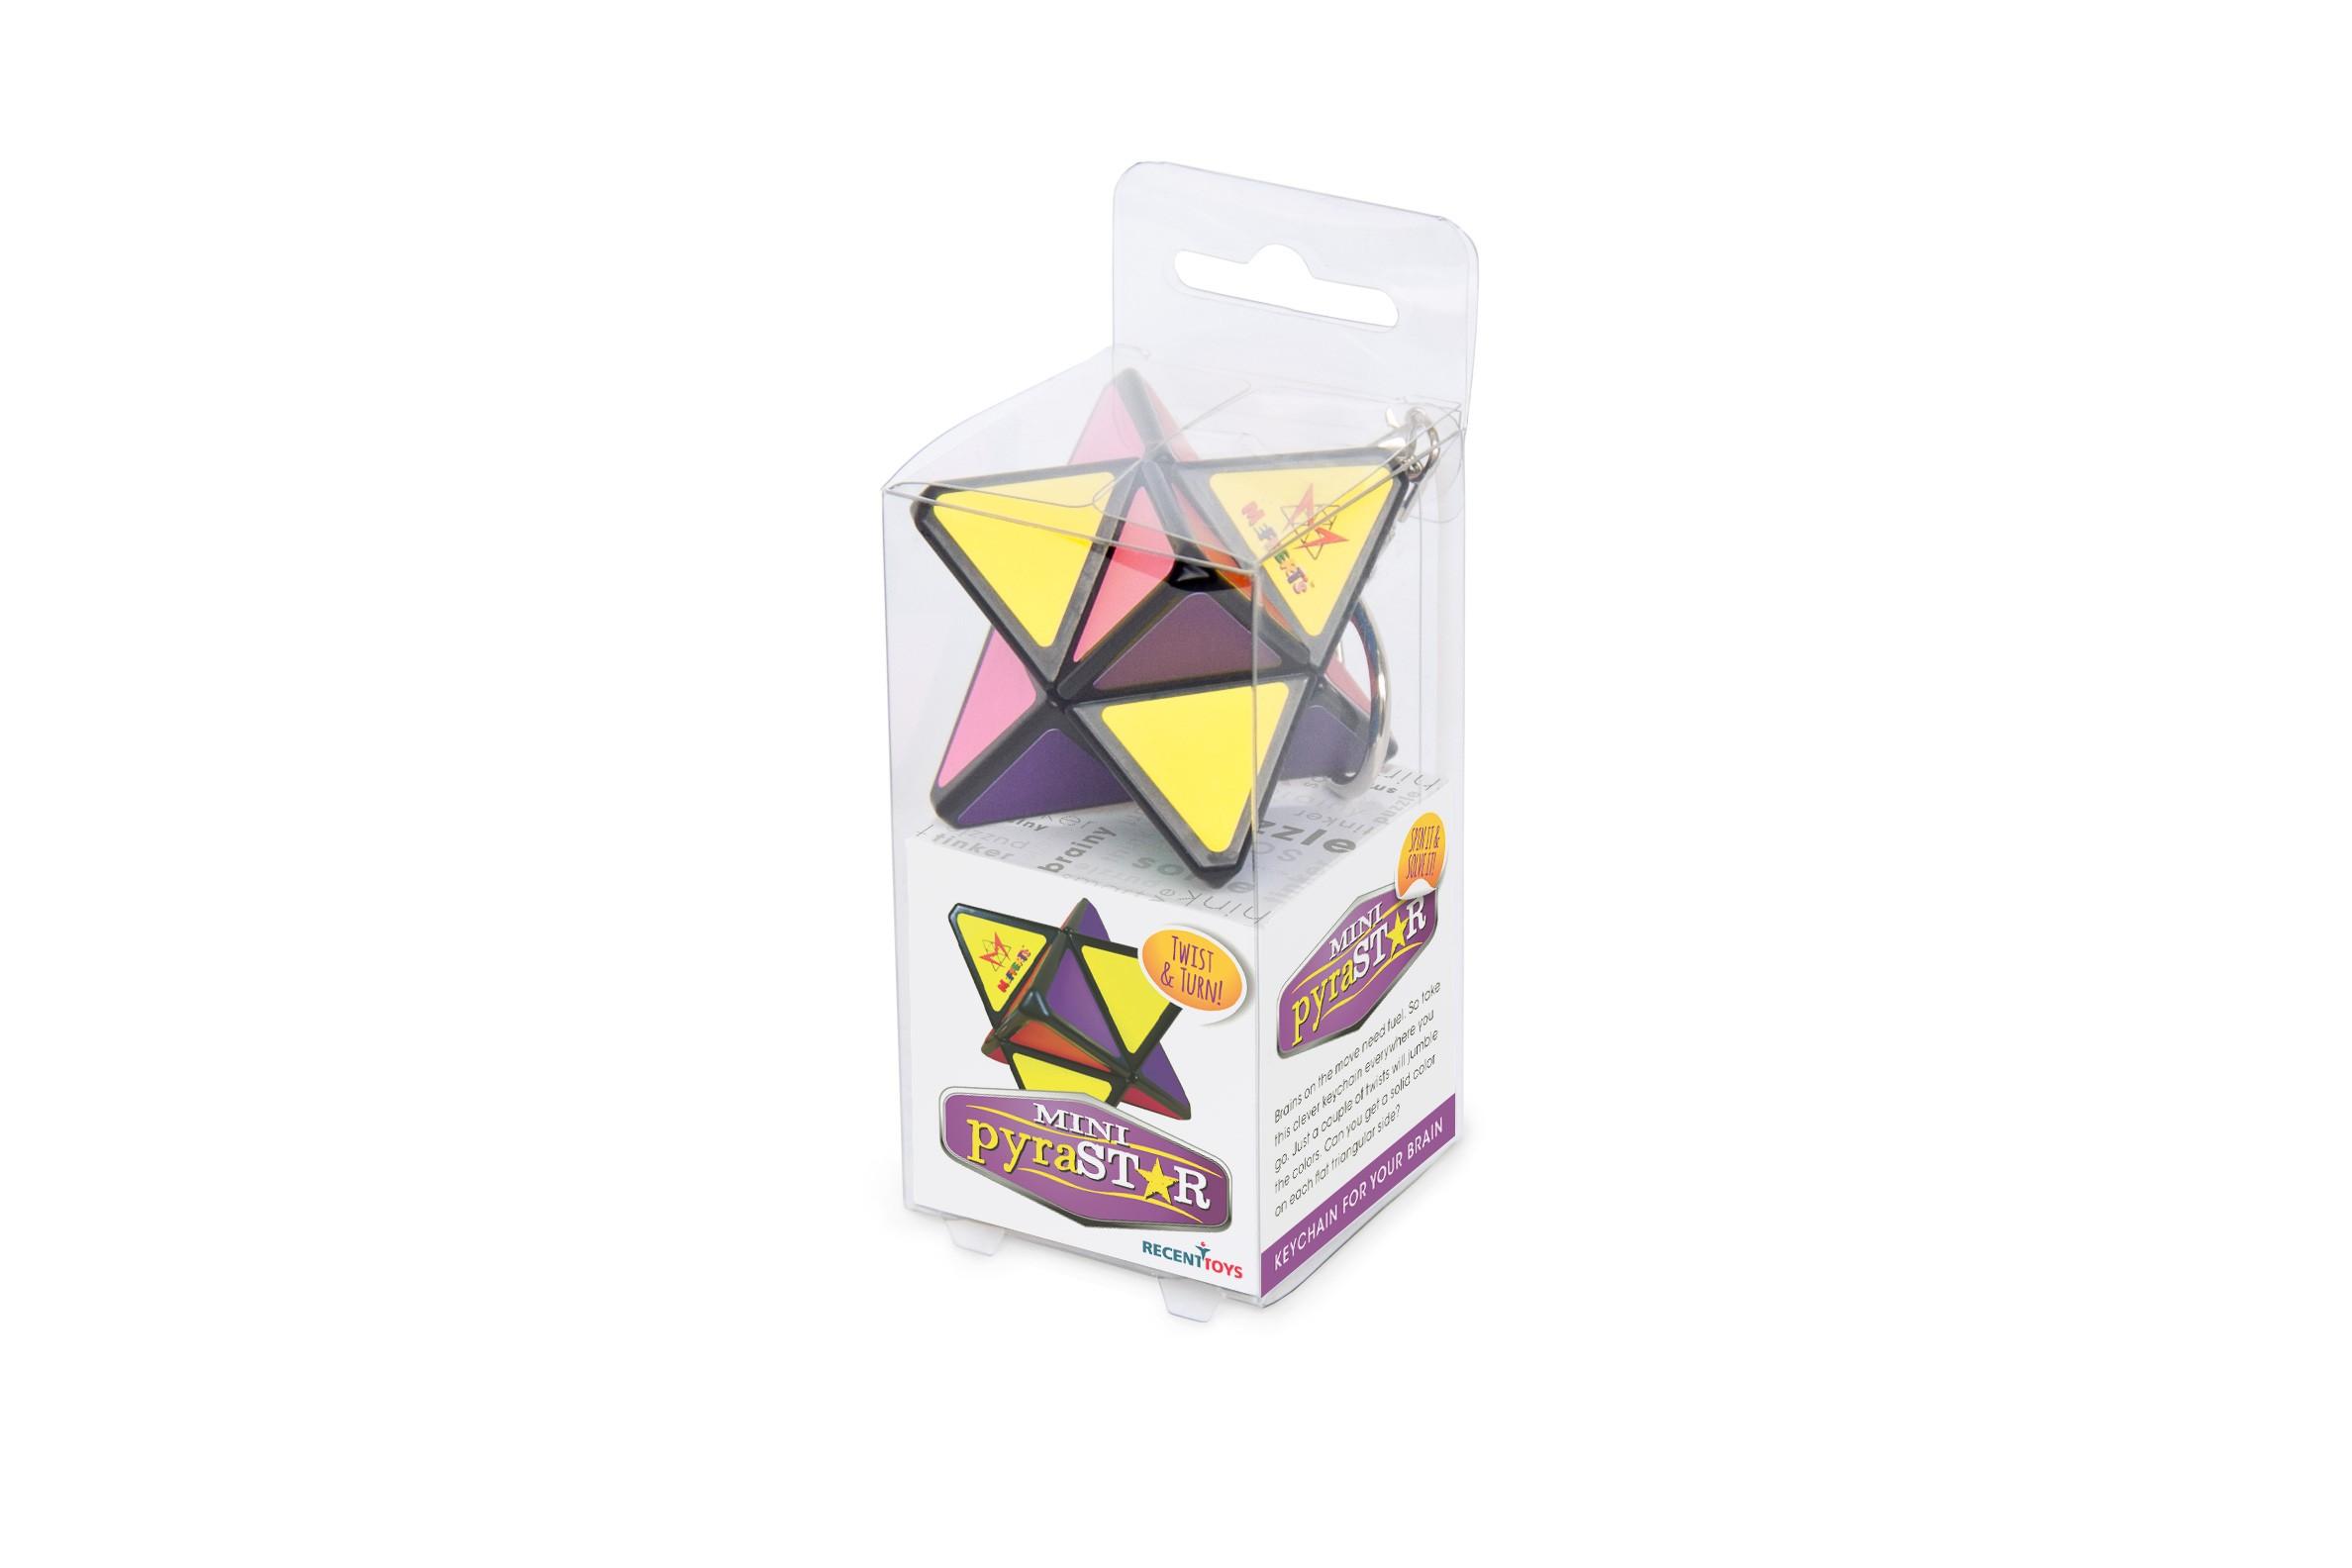 Casse-têtes - Mini pyrastar --Riviera Games